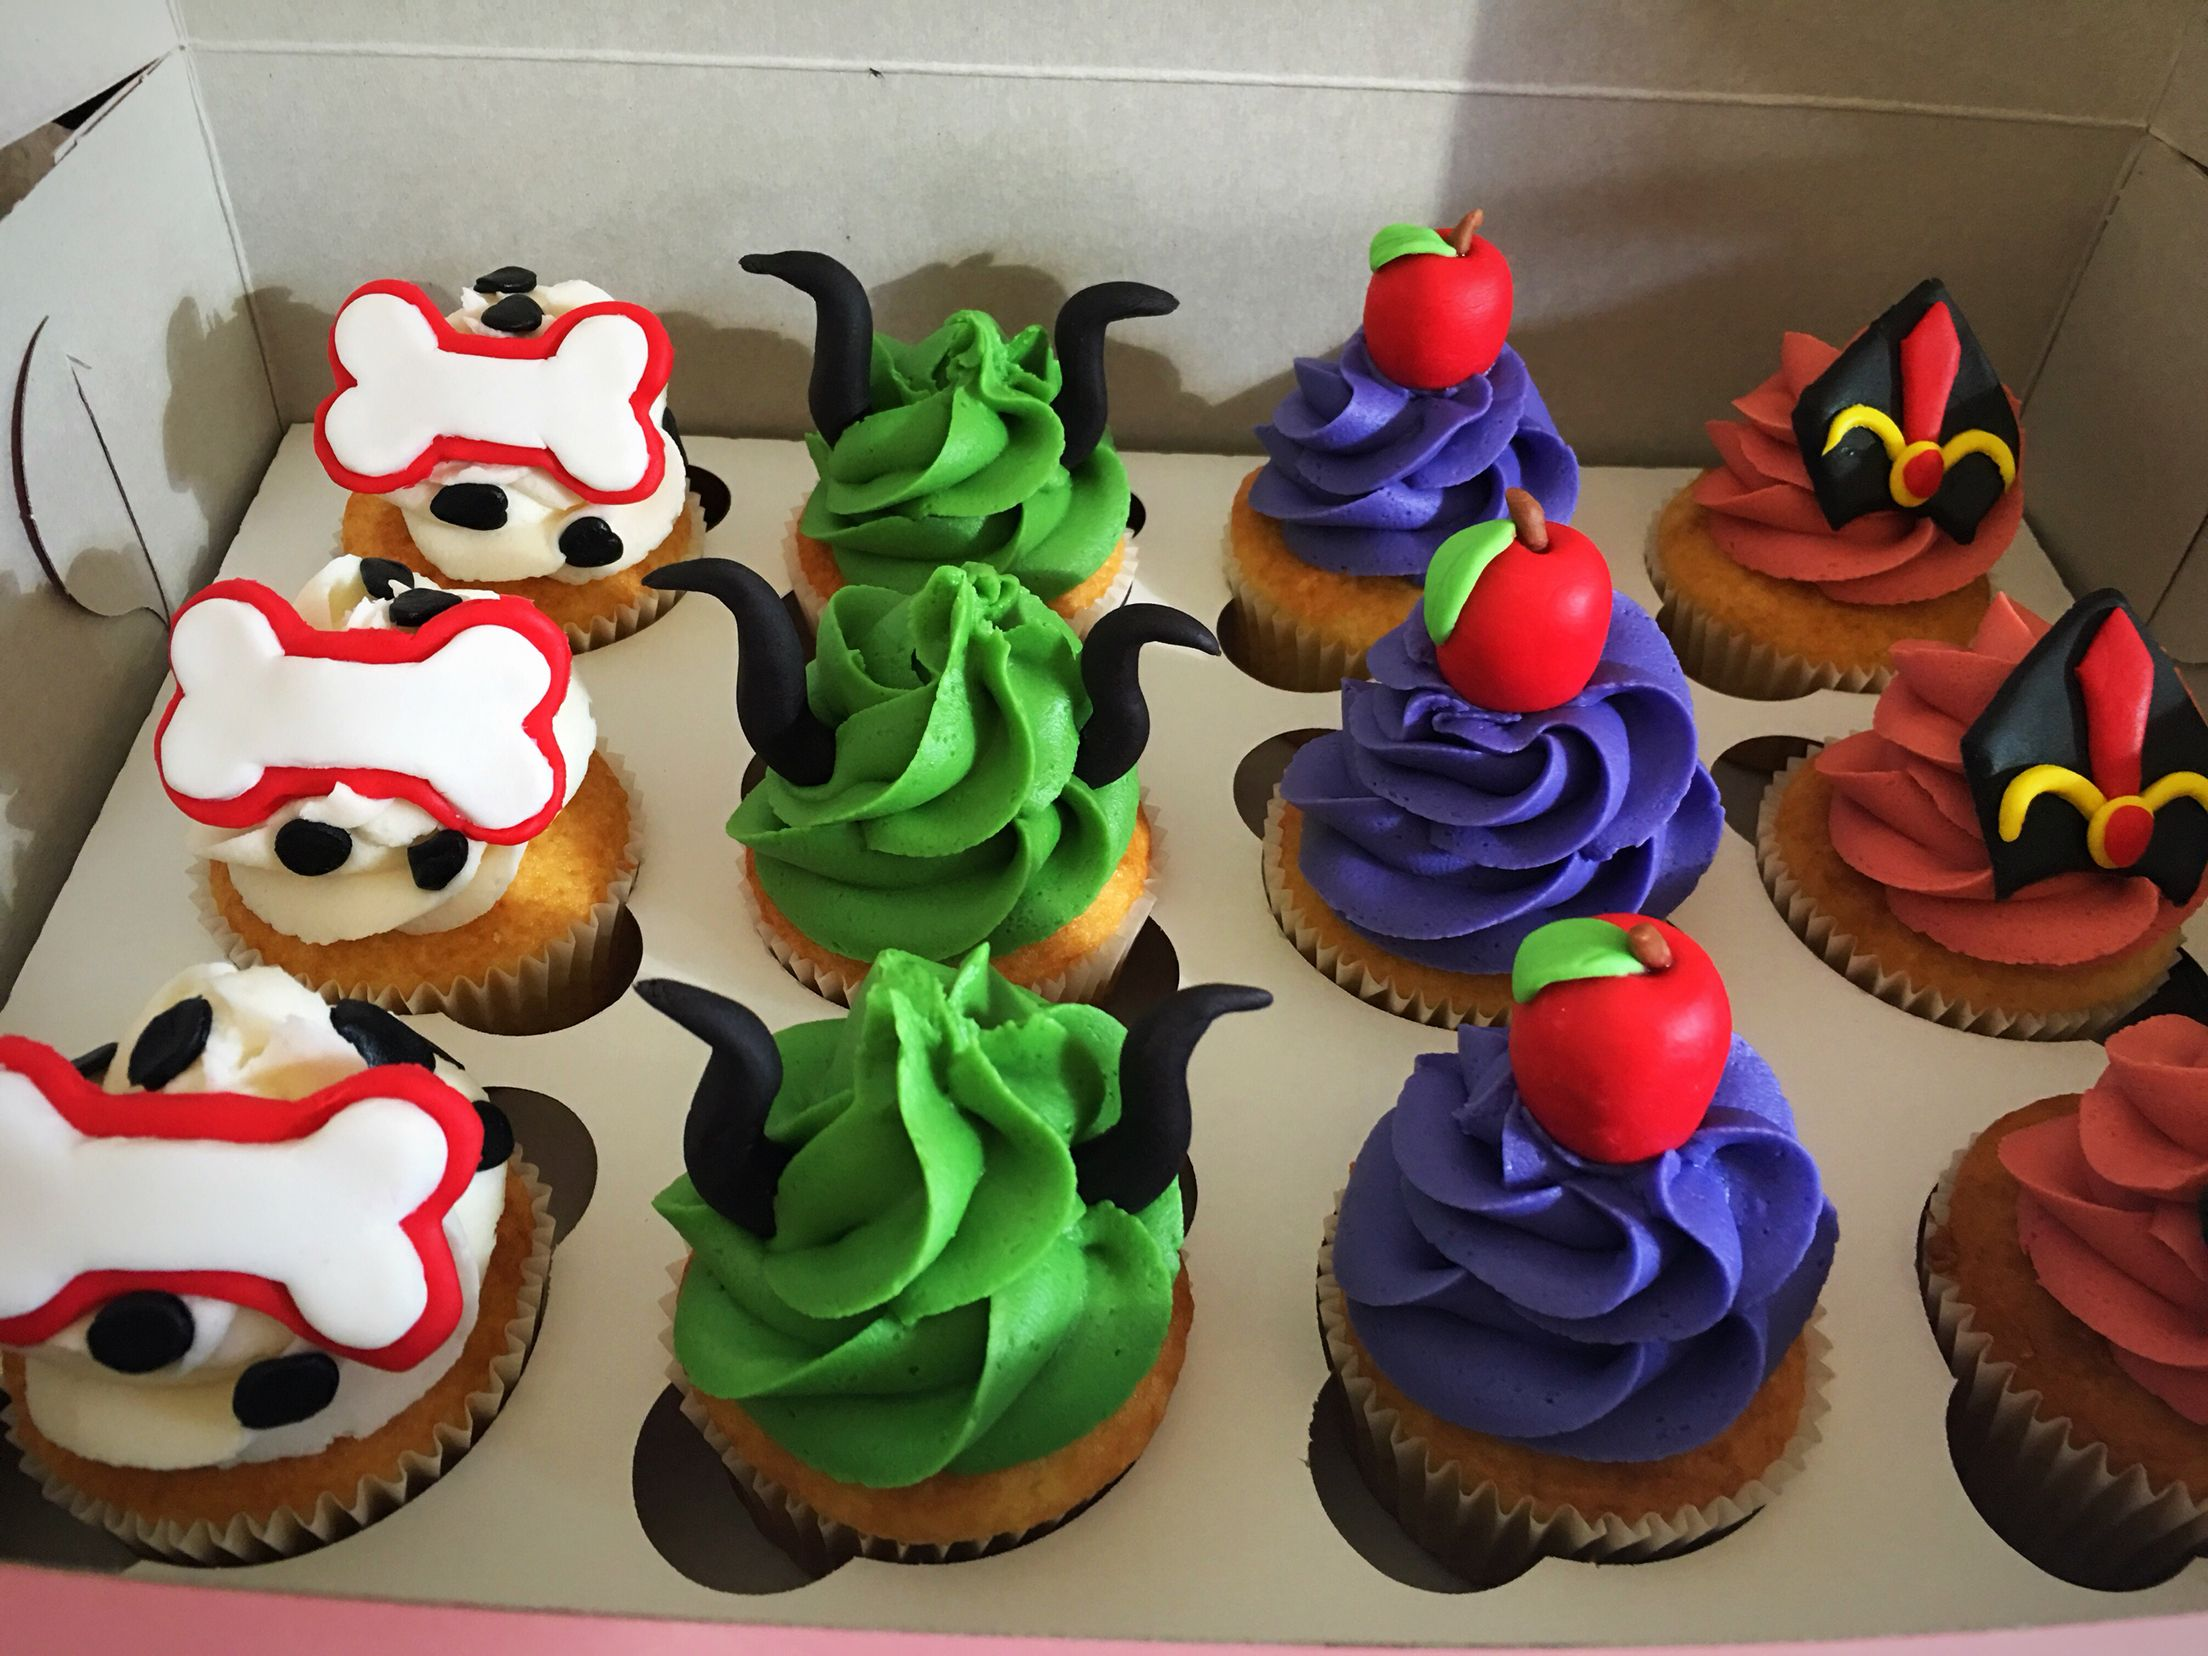 Descendants Cake Designs : Descendants cupcakes Descendants party Cake cake cake ...